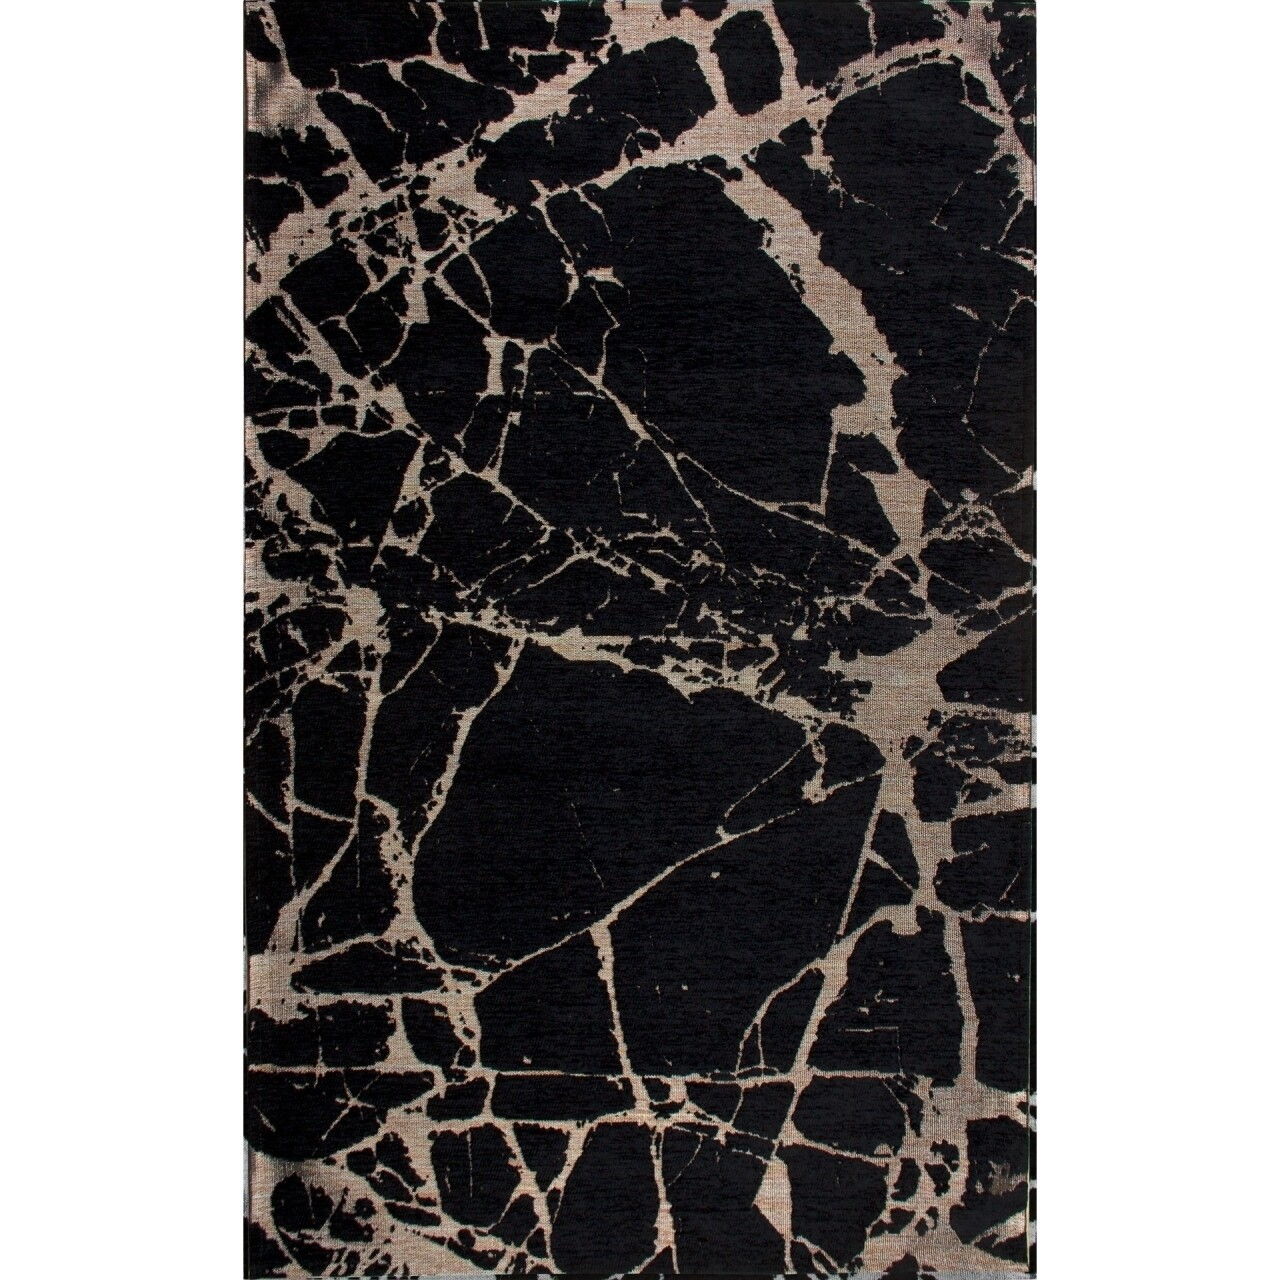 Covor rezistent Eko, SM 21 - Black, Gold XW, 100% acril, 80 x 150 cm